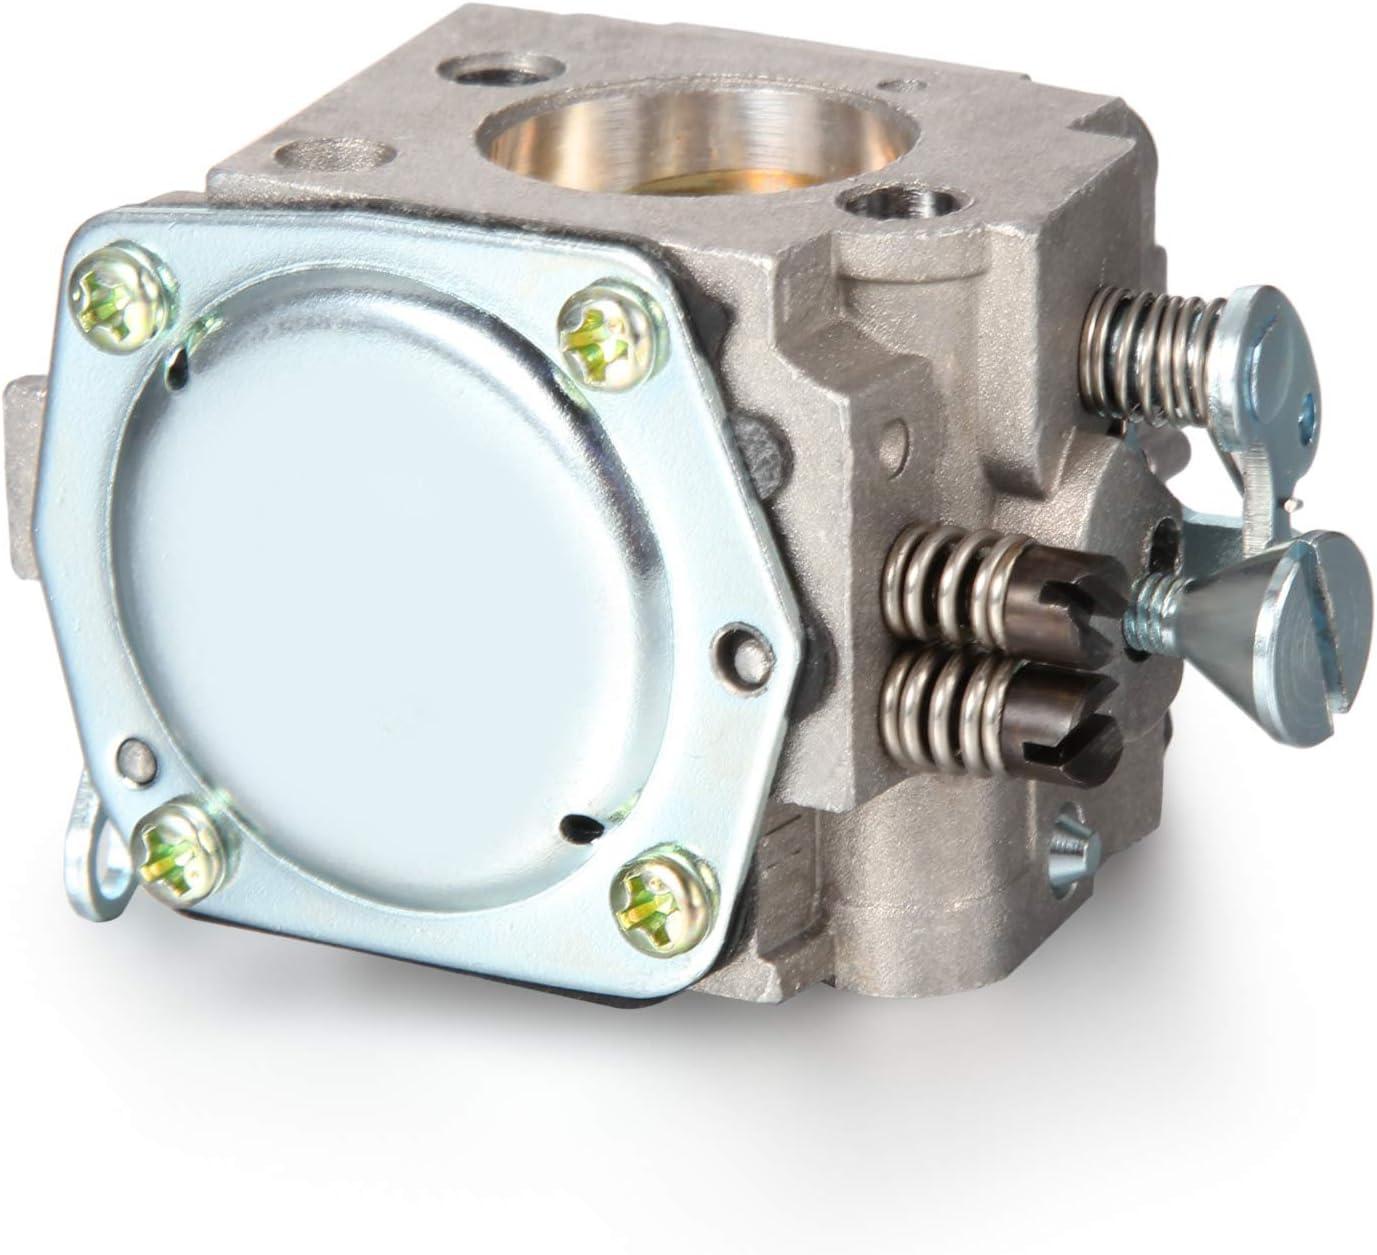 Carburador Twilight Garage para motosierra HUSQVARNA 61 266 268 272 272XP